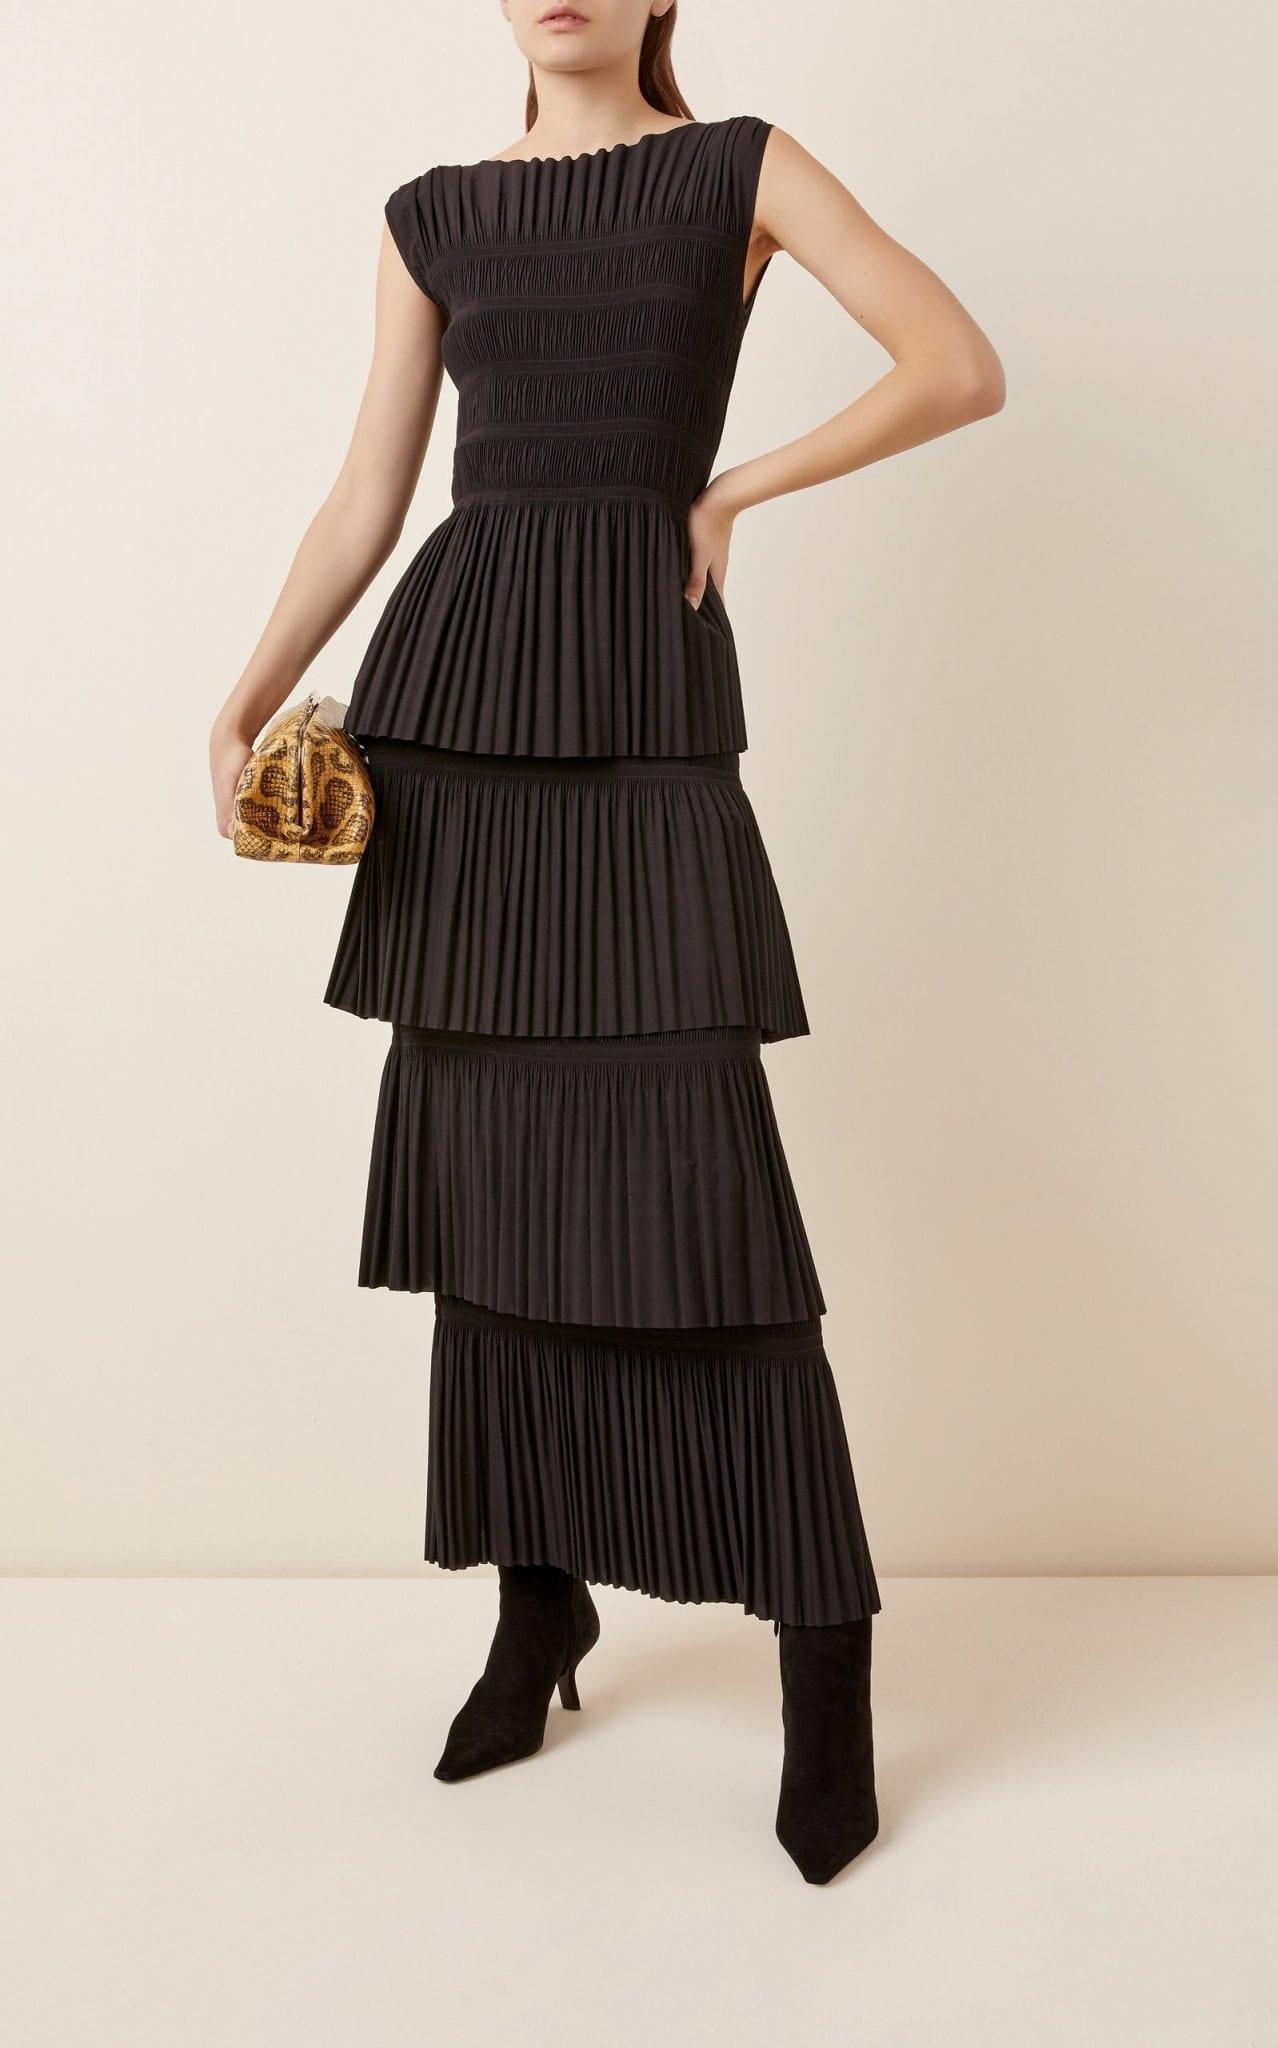 TOTEME Aramon Tiered Pleated Crepe Maxi Dress